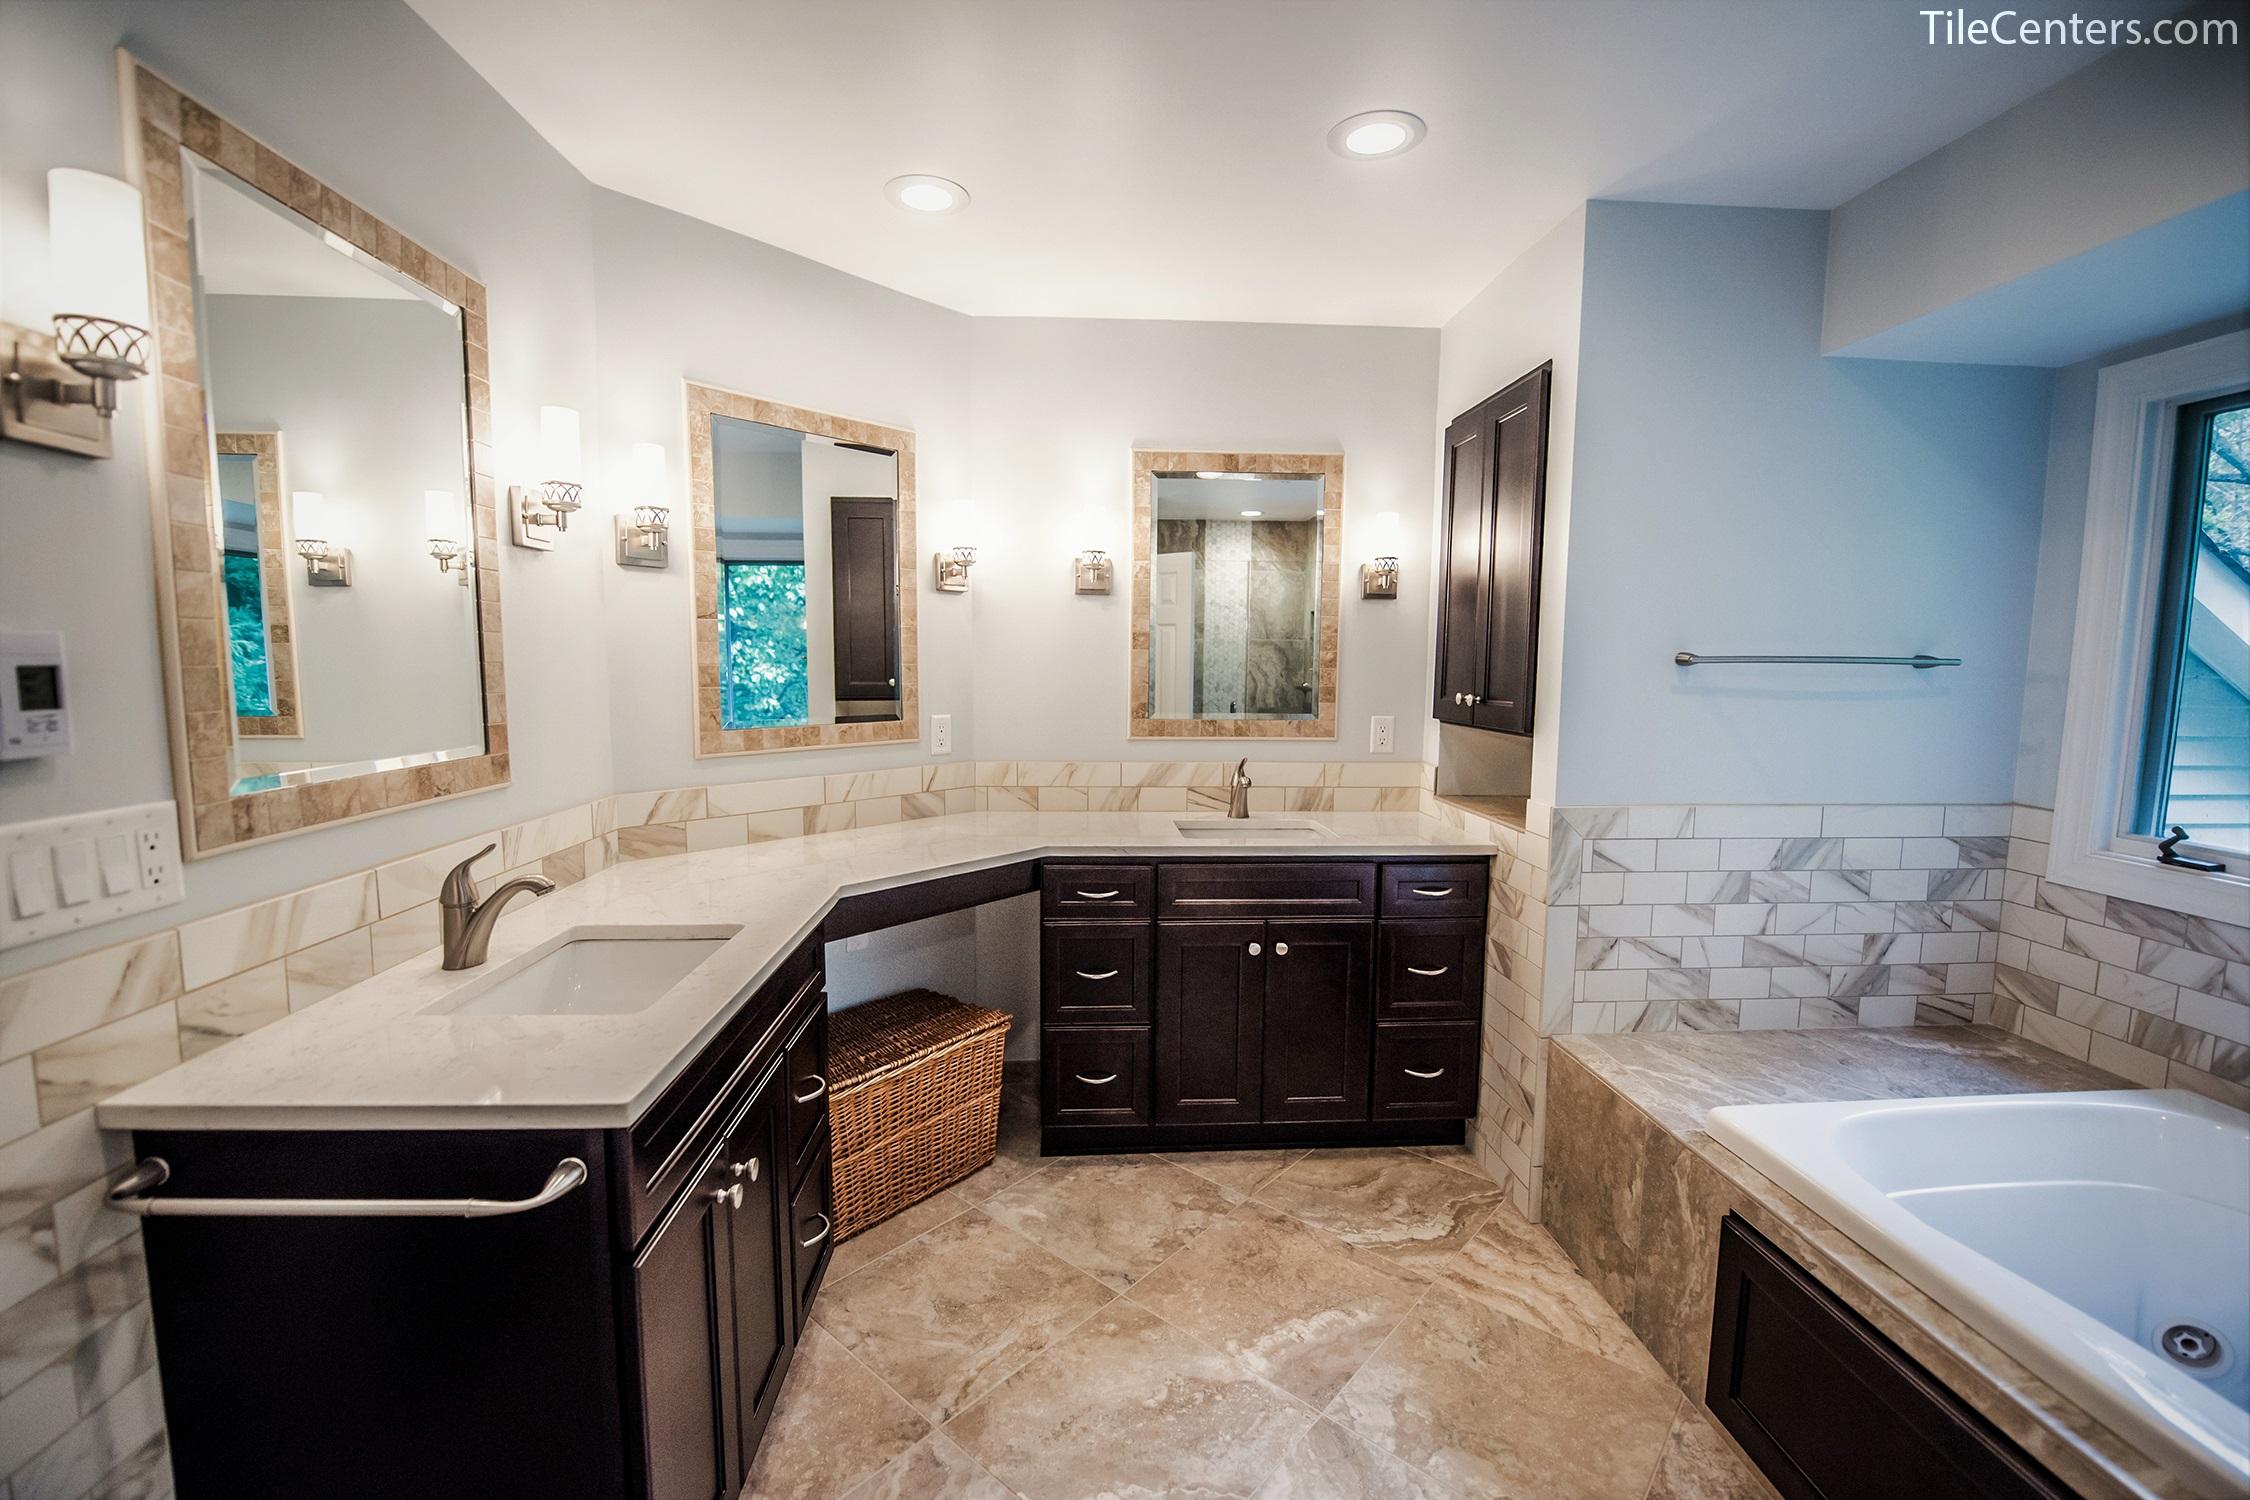 Greco Roman Bathroom Remodel Gaithersburg MD - Gaithersburg bathroom remodeling